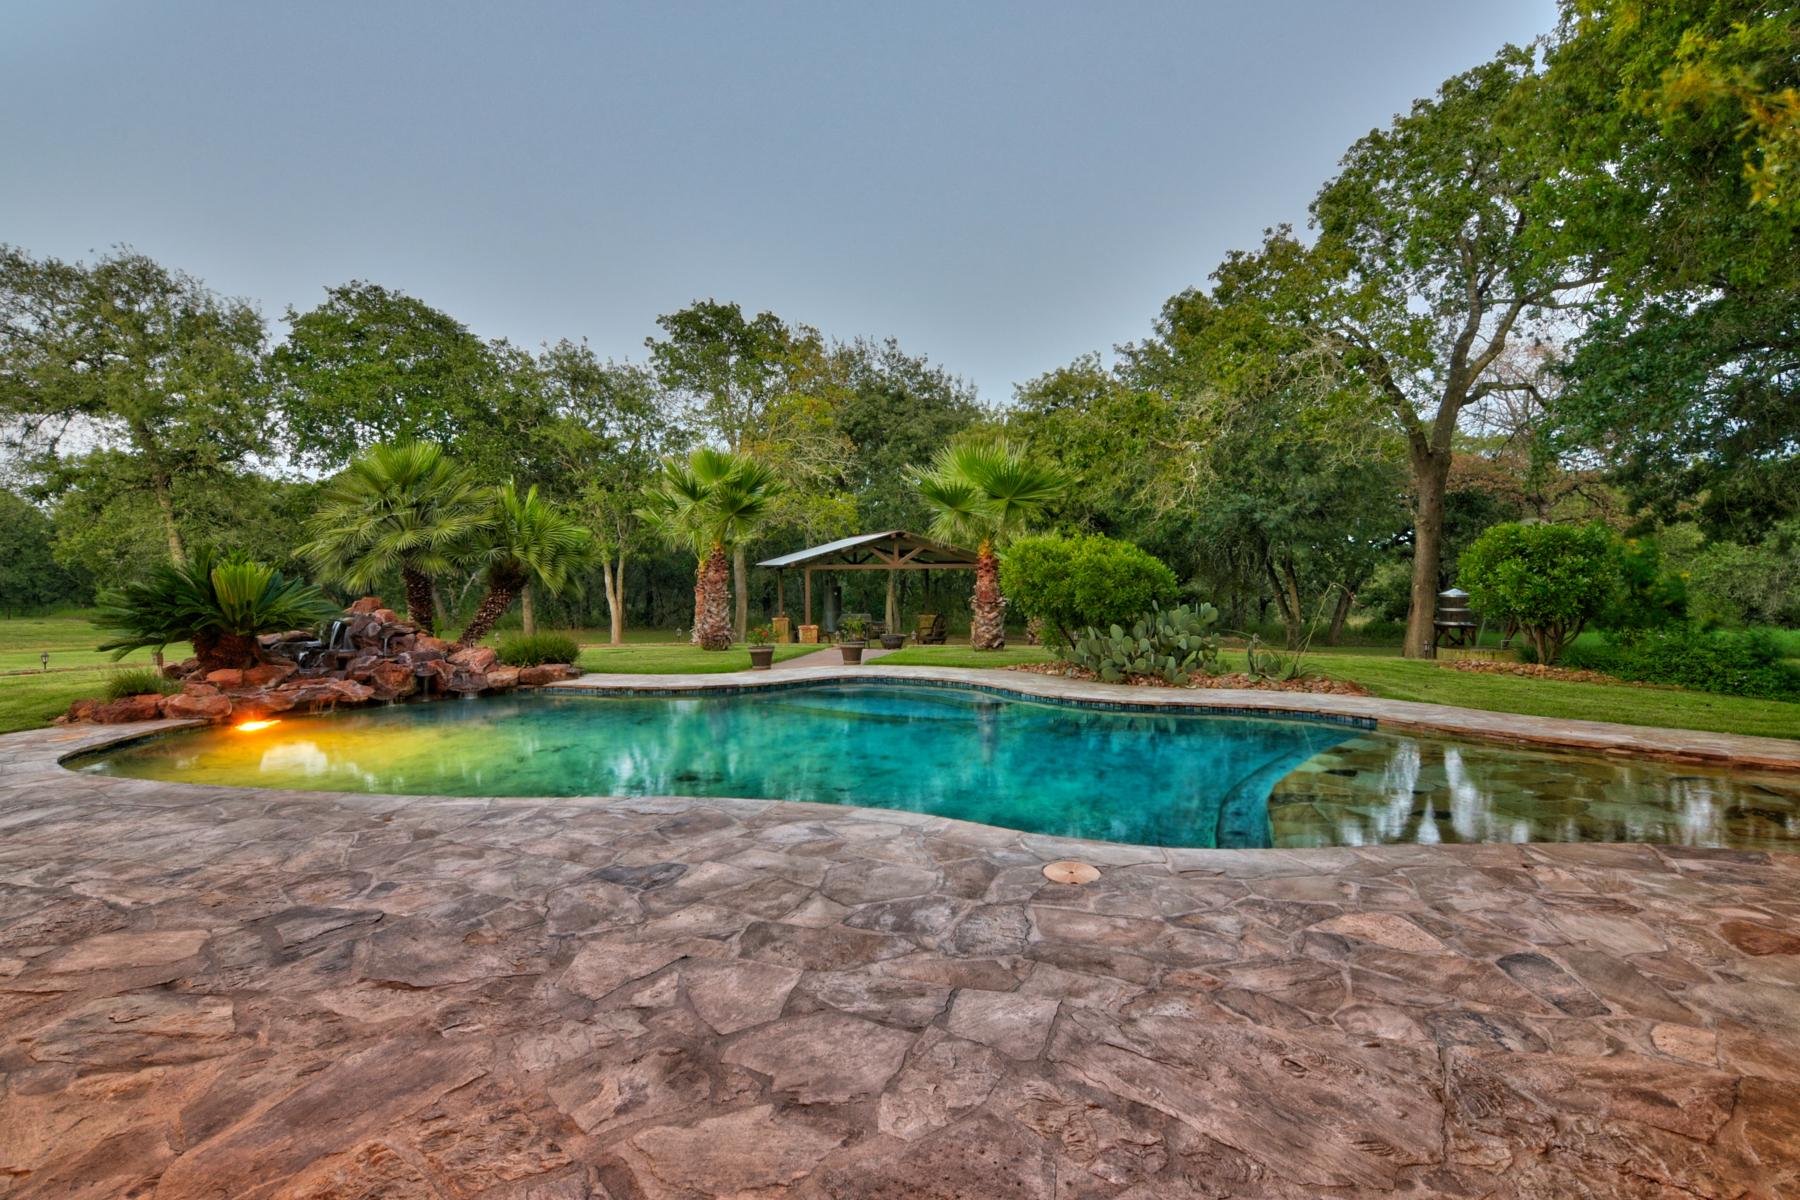 Additional photo for property listing at Breathtaking La Vernia Gem 7489 FM 775 La Vernia, Texas 78121 Estados Unidos